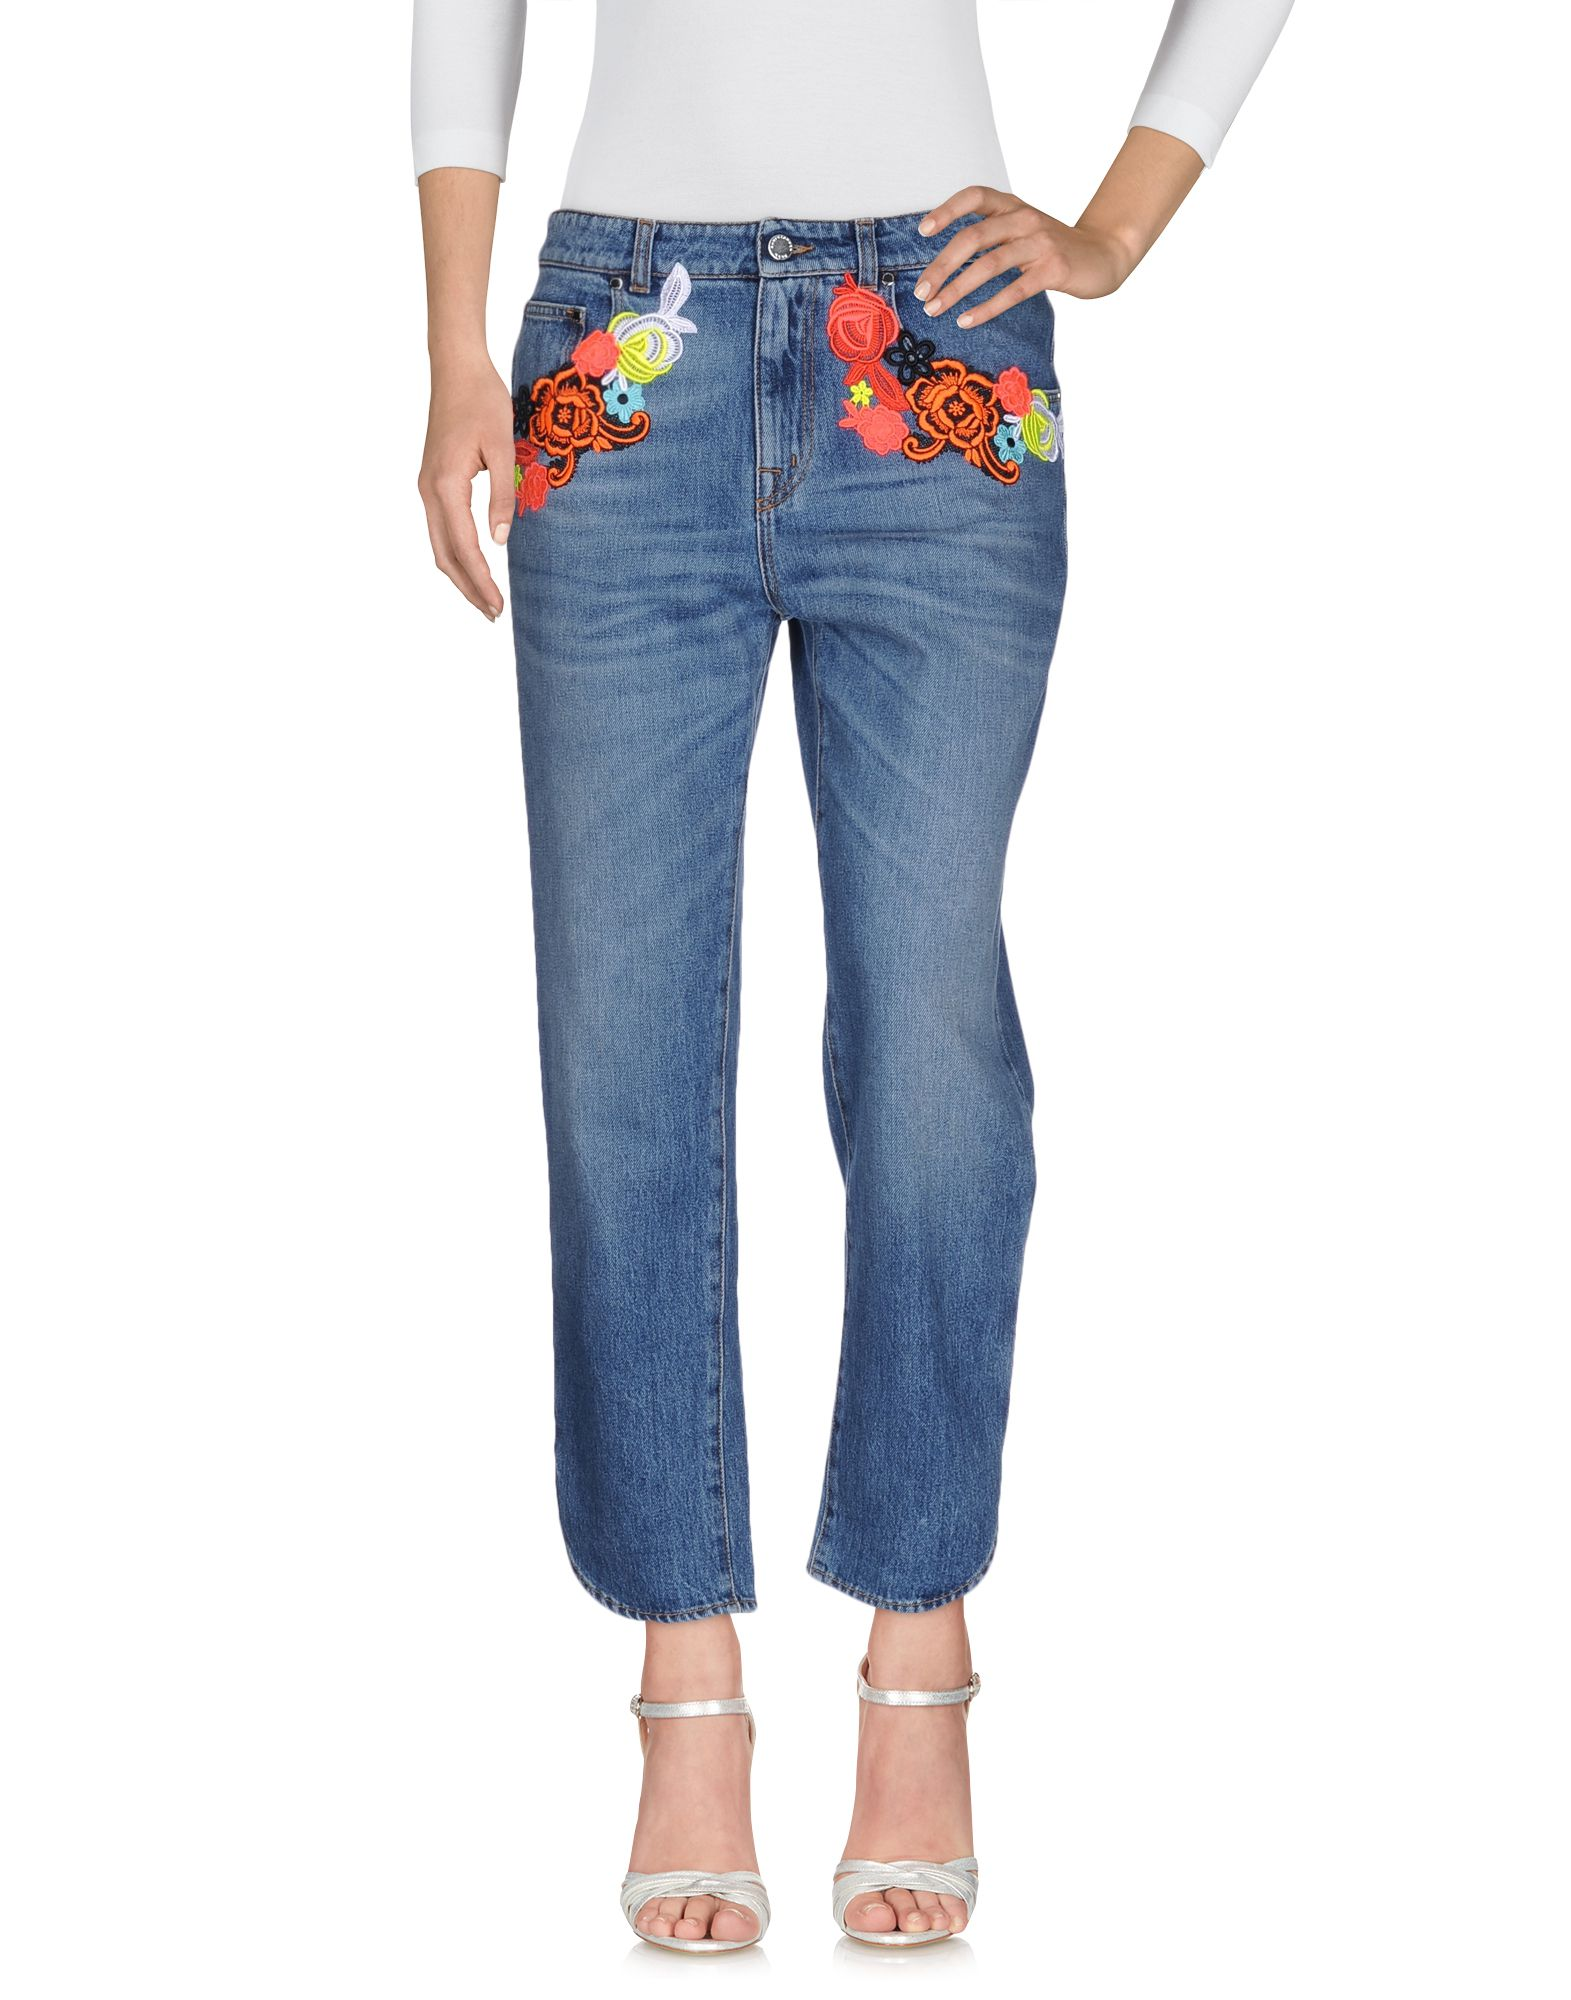 Pantaloni Jeans Christopher Kane Donna - Acquista online su BqcaK